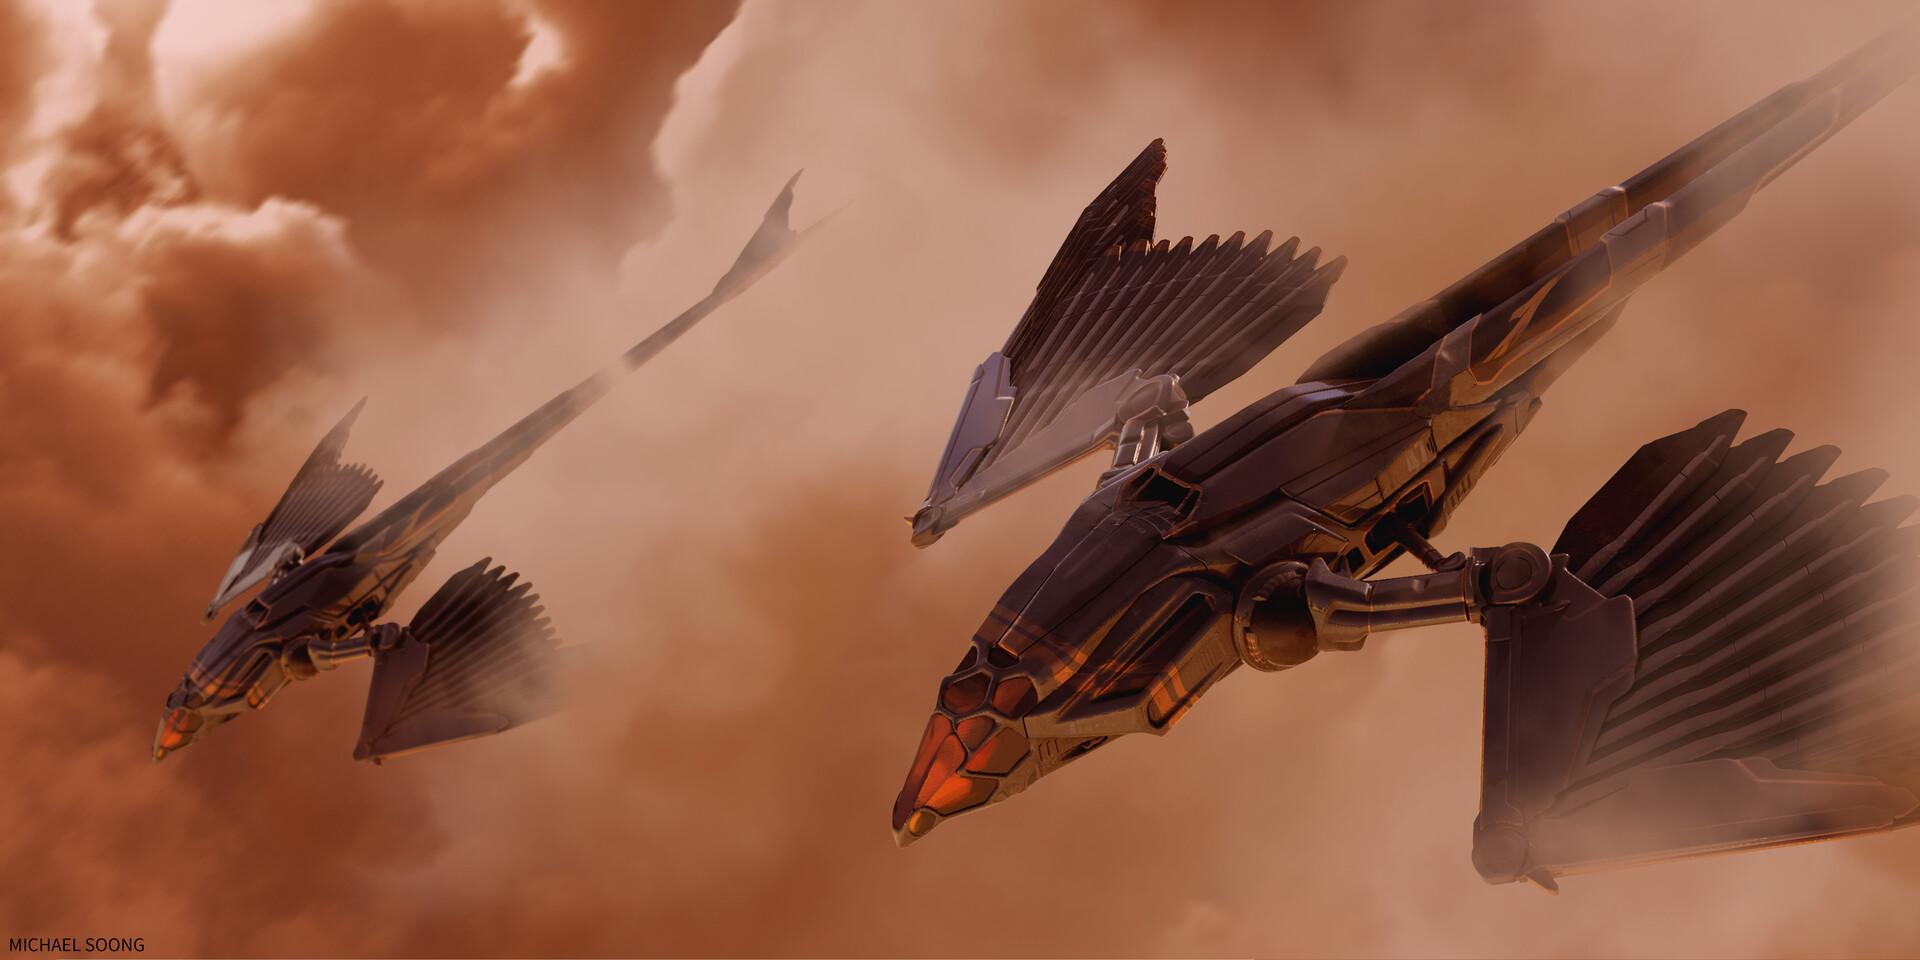 michael-soong-02-dune-ornithopter-keyframe2.jpg